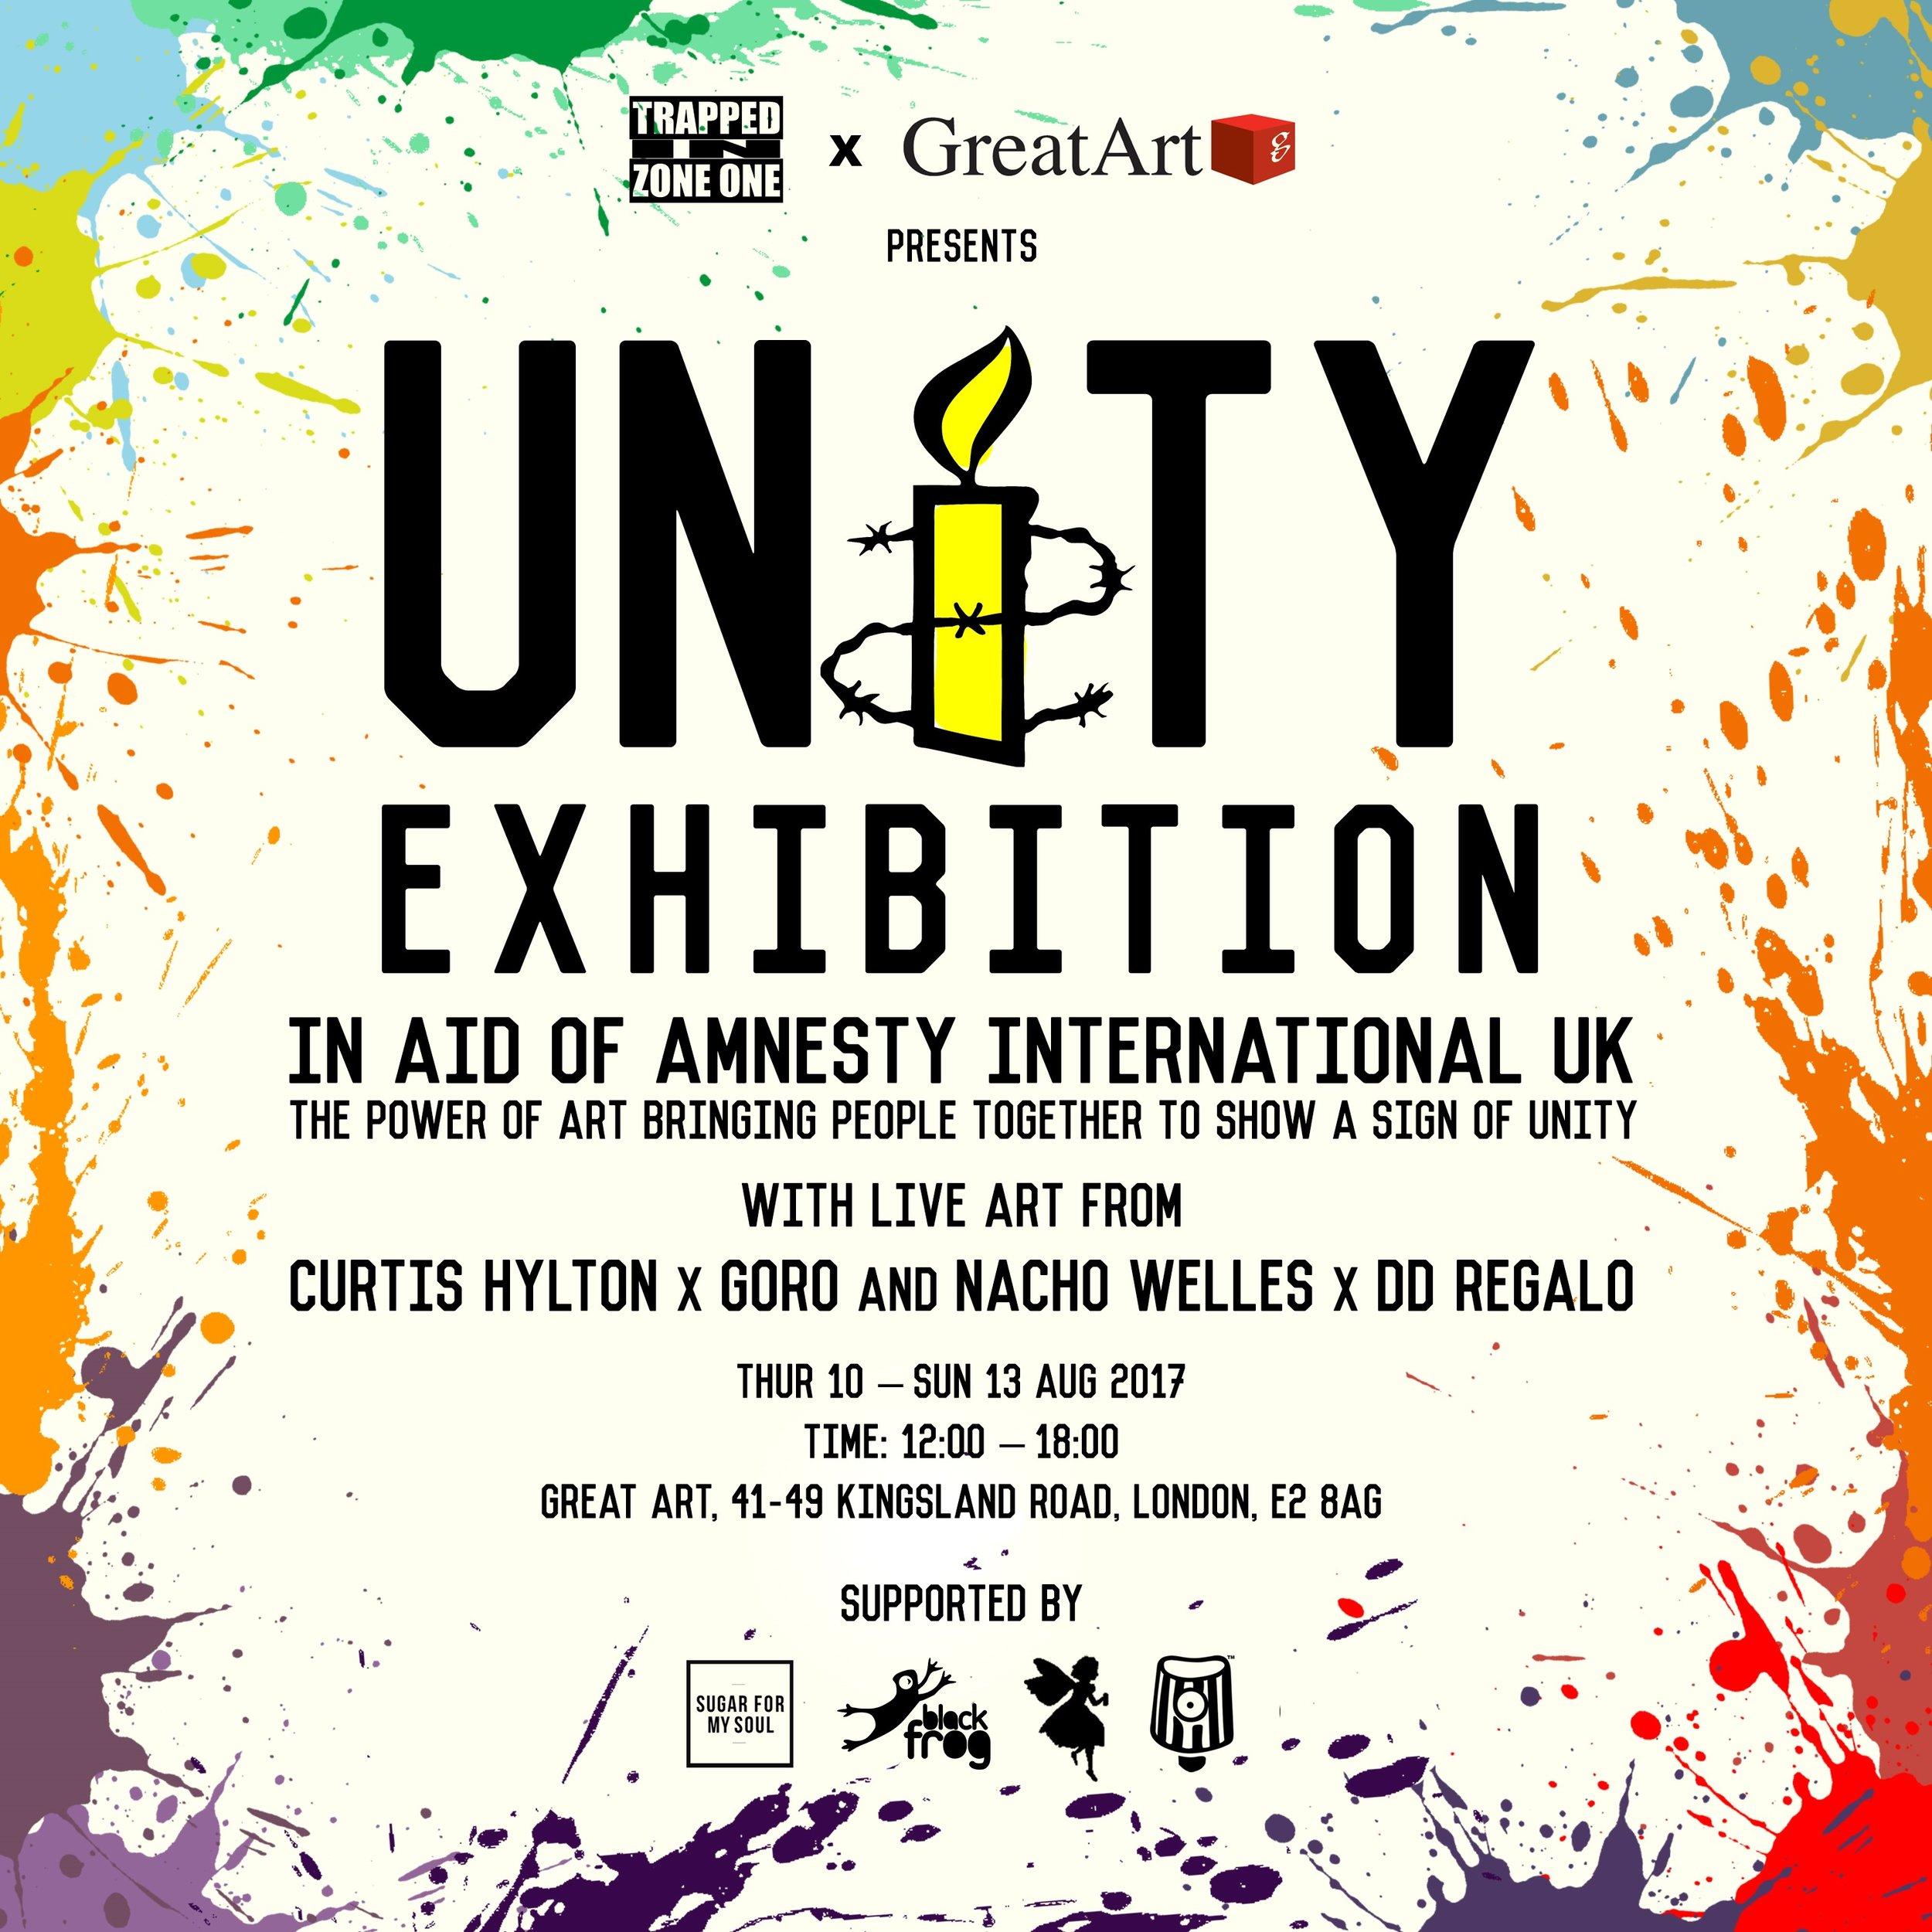 Unity Flyer x Great Art 1.0.jpg